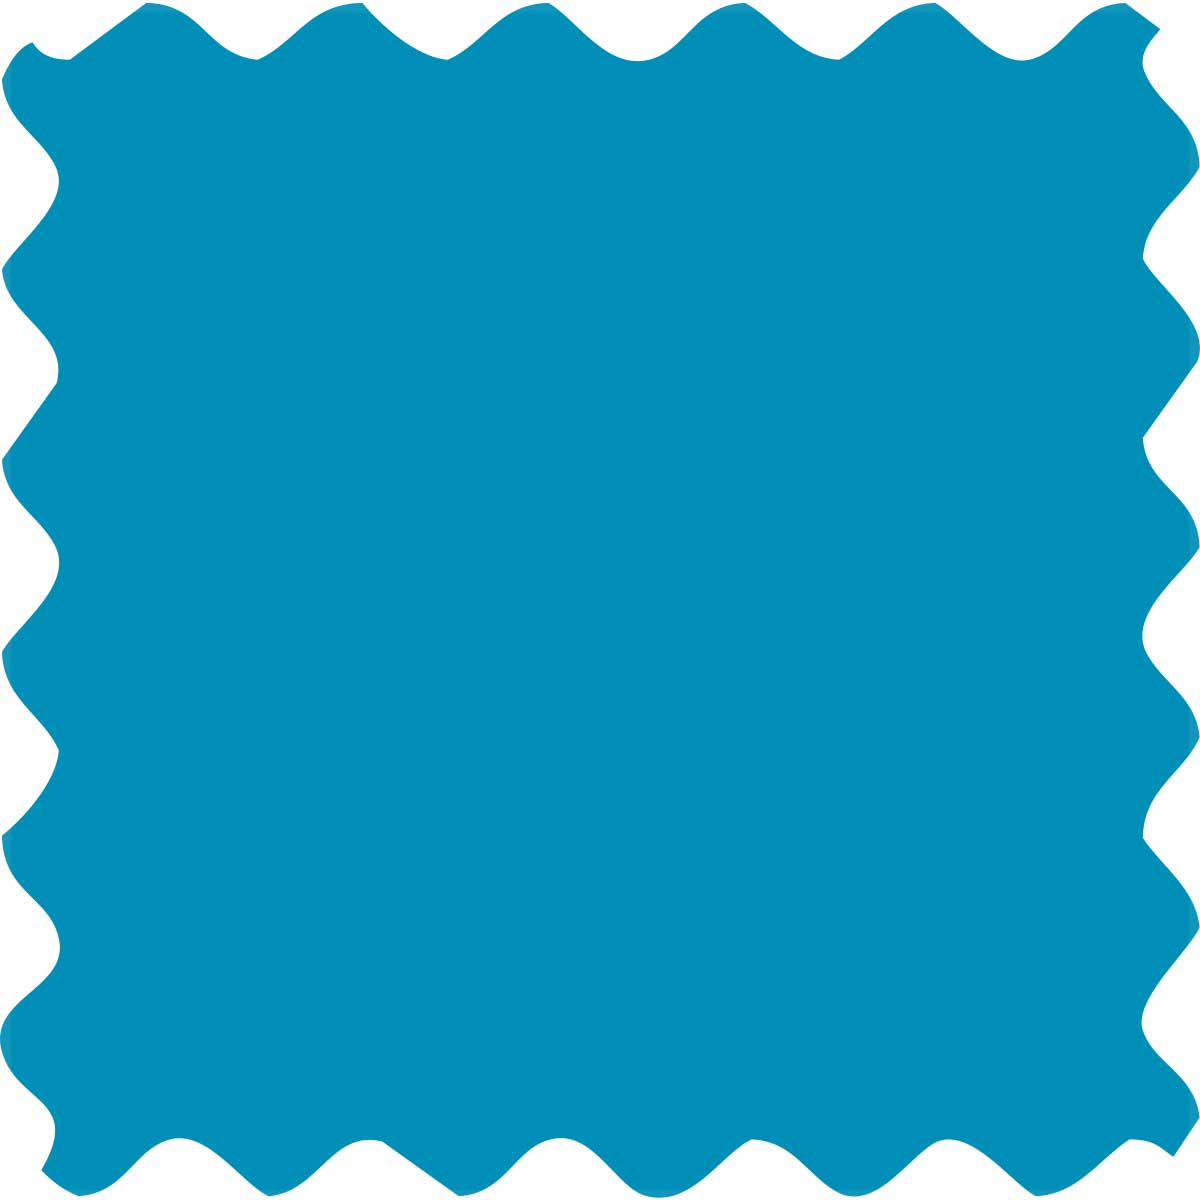 Fabric Creations™ Plush™ 3-D Fabric Paints - Blue Raspberry, 2 oz. - 26336